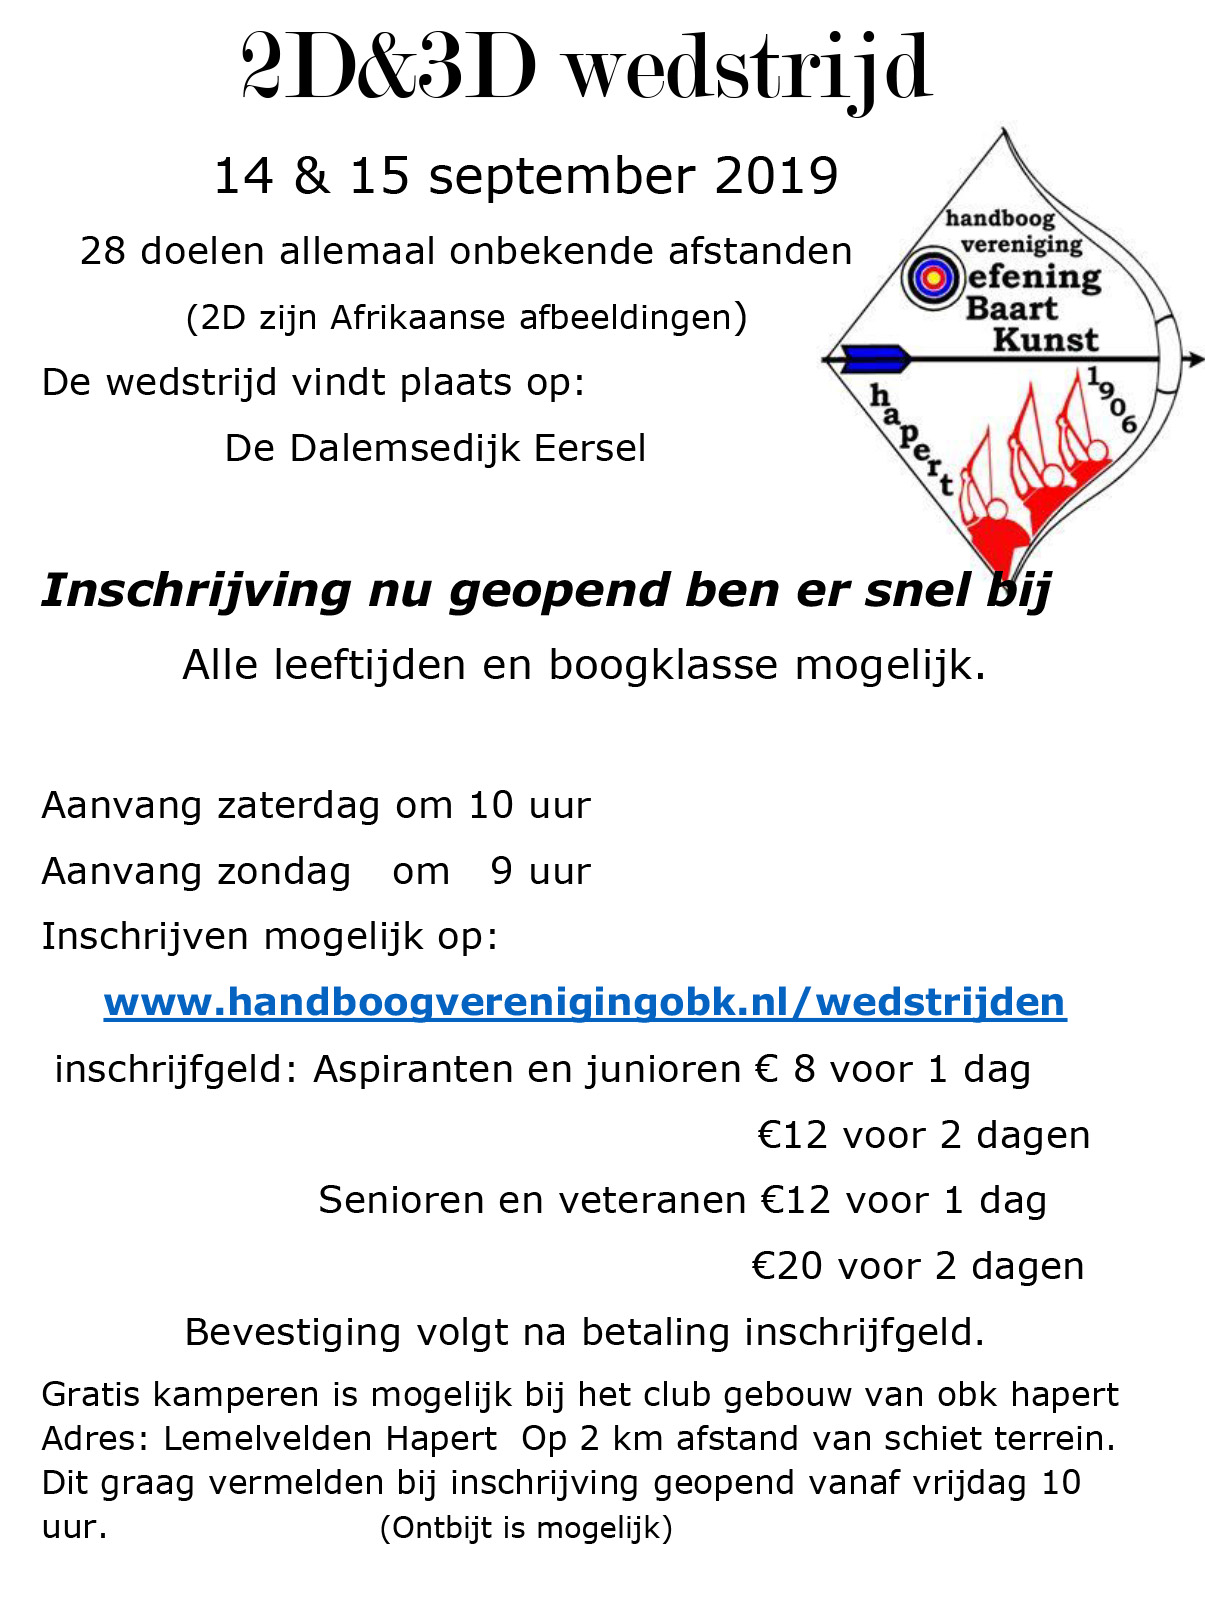 flyer 2D3D wedstrijd obk hapert official-1